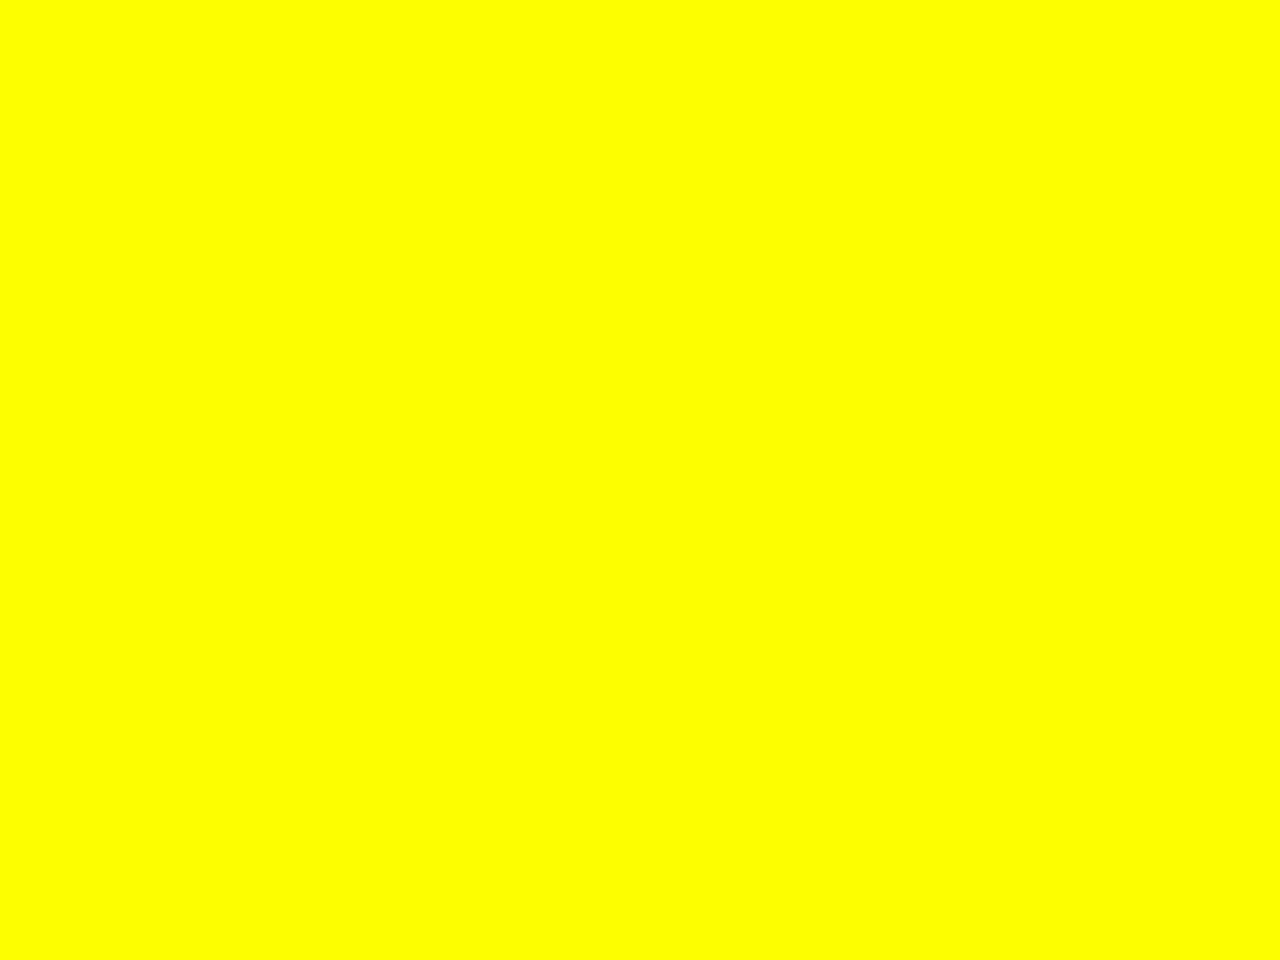 1280x960 Lemon Glacier Solid Color Background